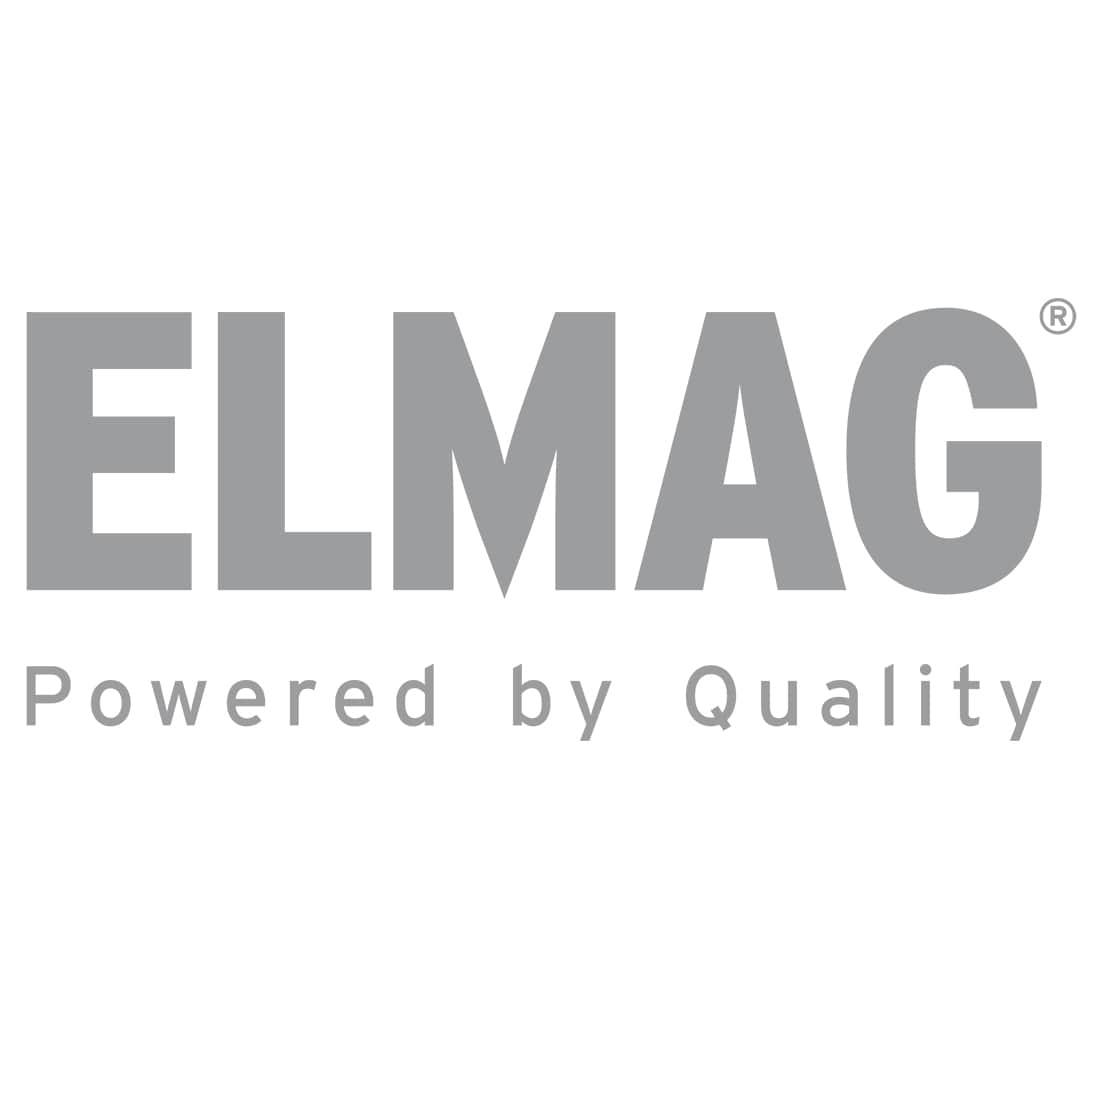 Welding inverter PUMA 1501 PFC - Super Set